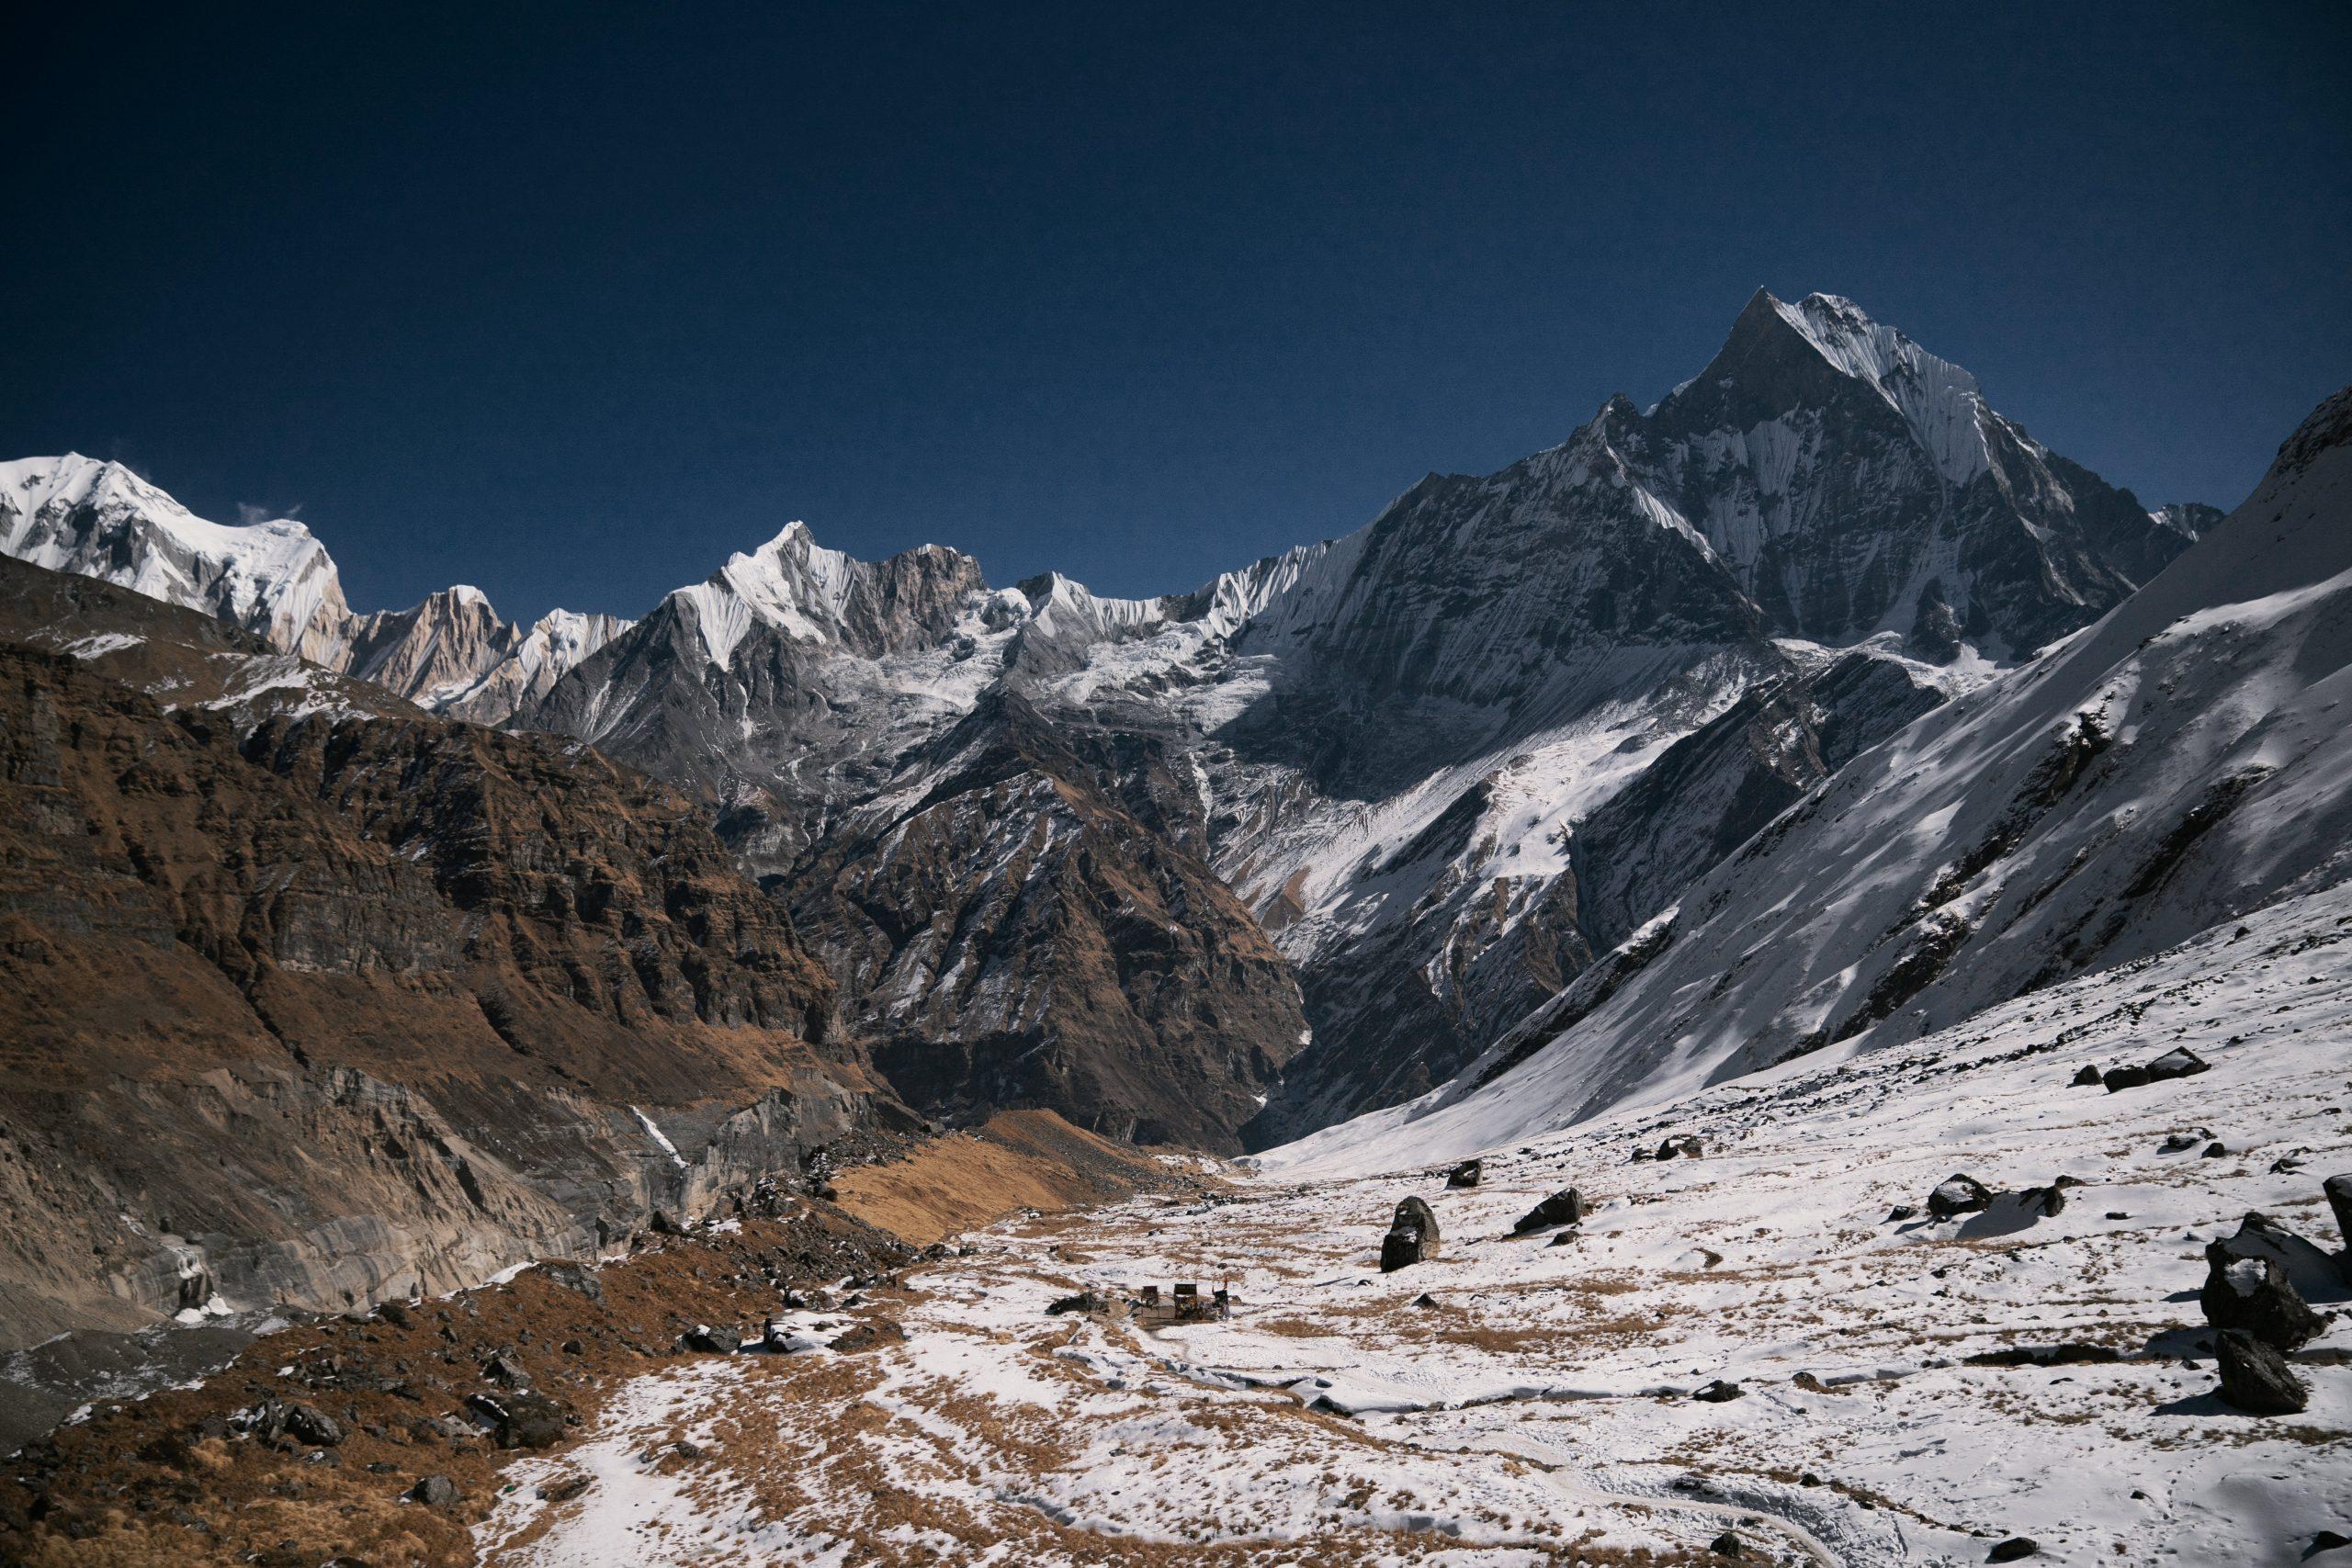 Manaslu and Annapurna Trek with Tilicho Lake